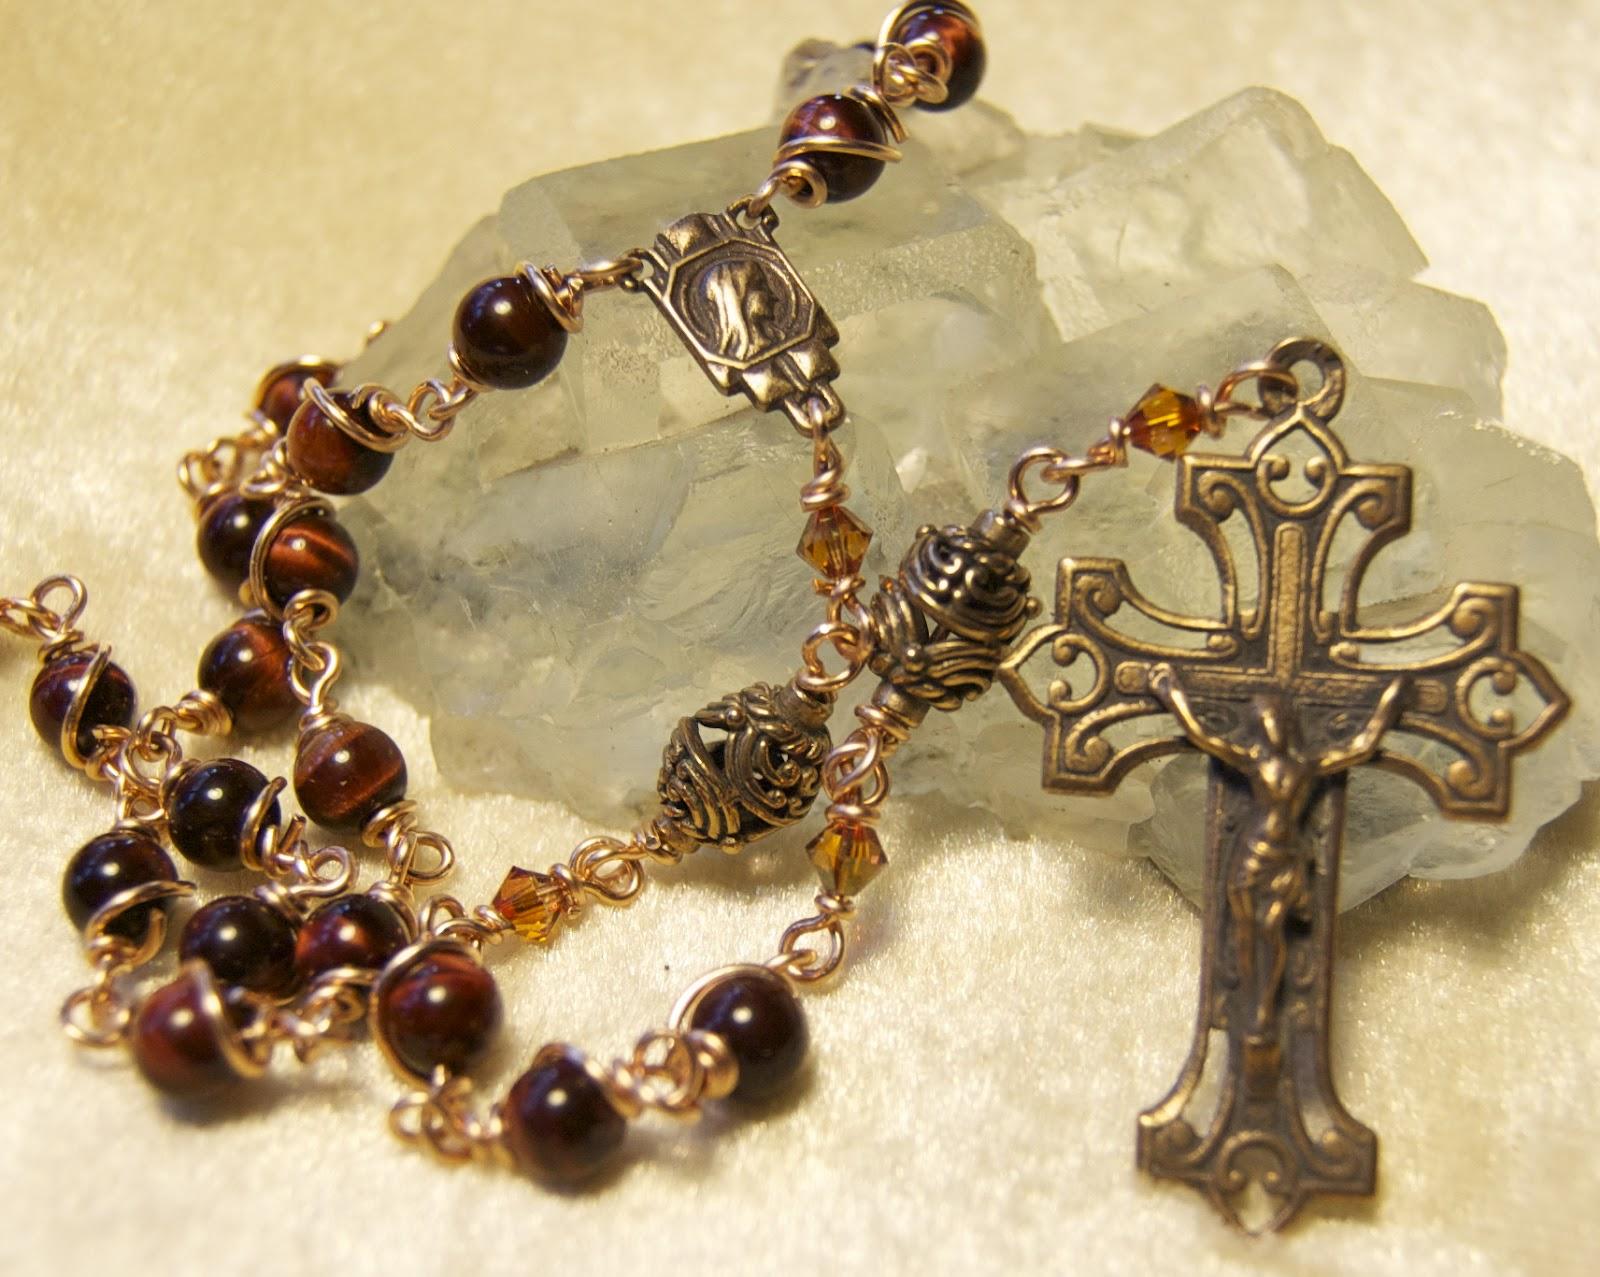 HeartFelt Rosaries: A Beautiful, Unbreakable Pocket Rosary